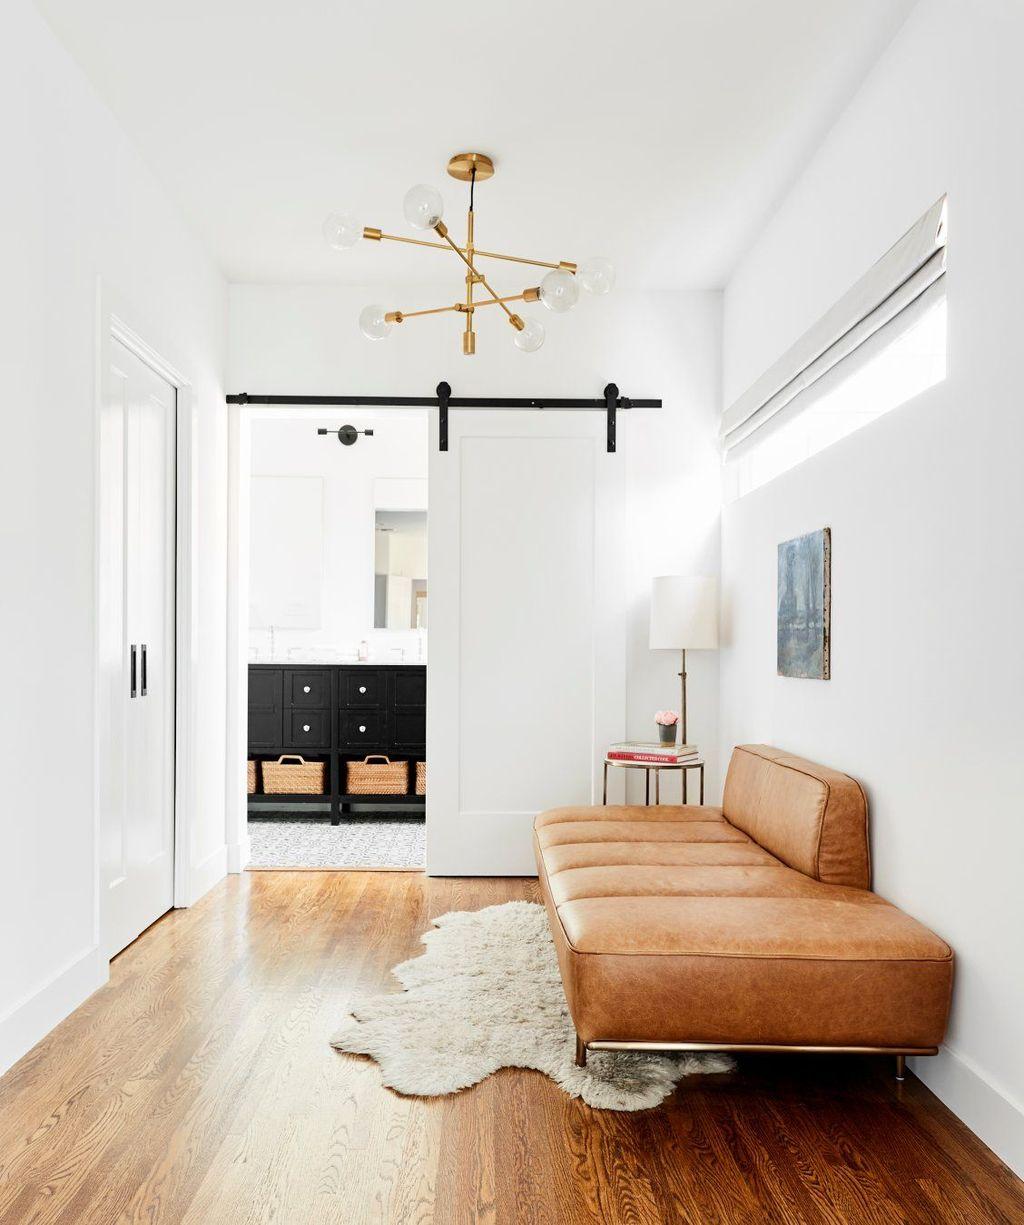 Inspiring Modern Home Furnishings Design Ideas 03